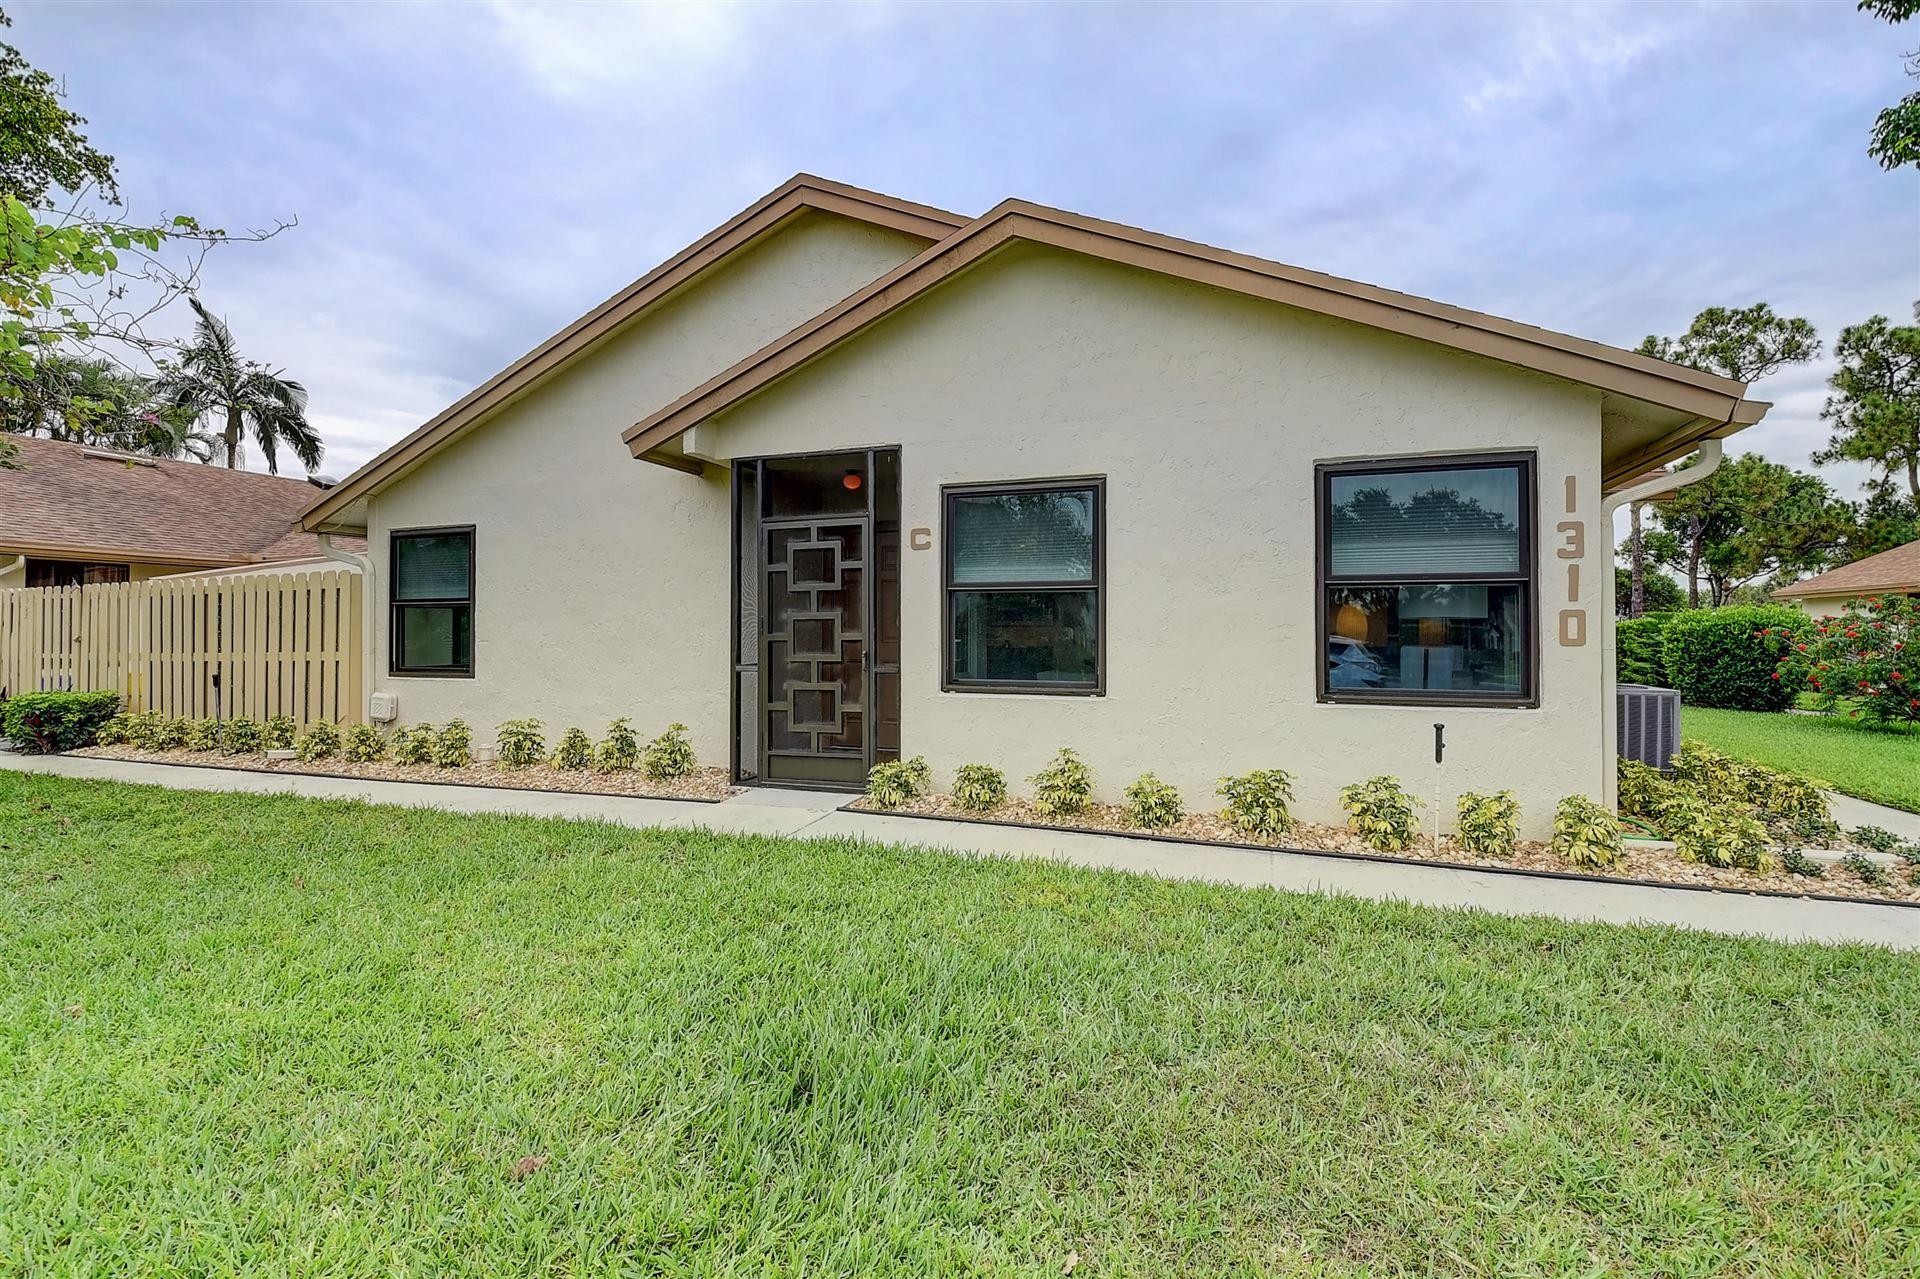 1310 NW 29th Avenue #C, Delray Beach, FL 33445 - MLS#: RX-10716470